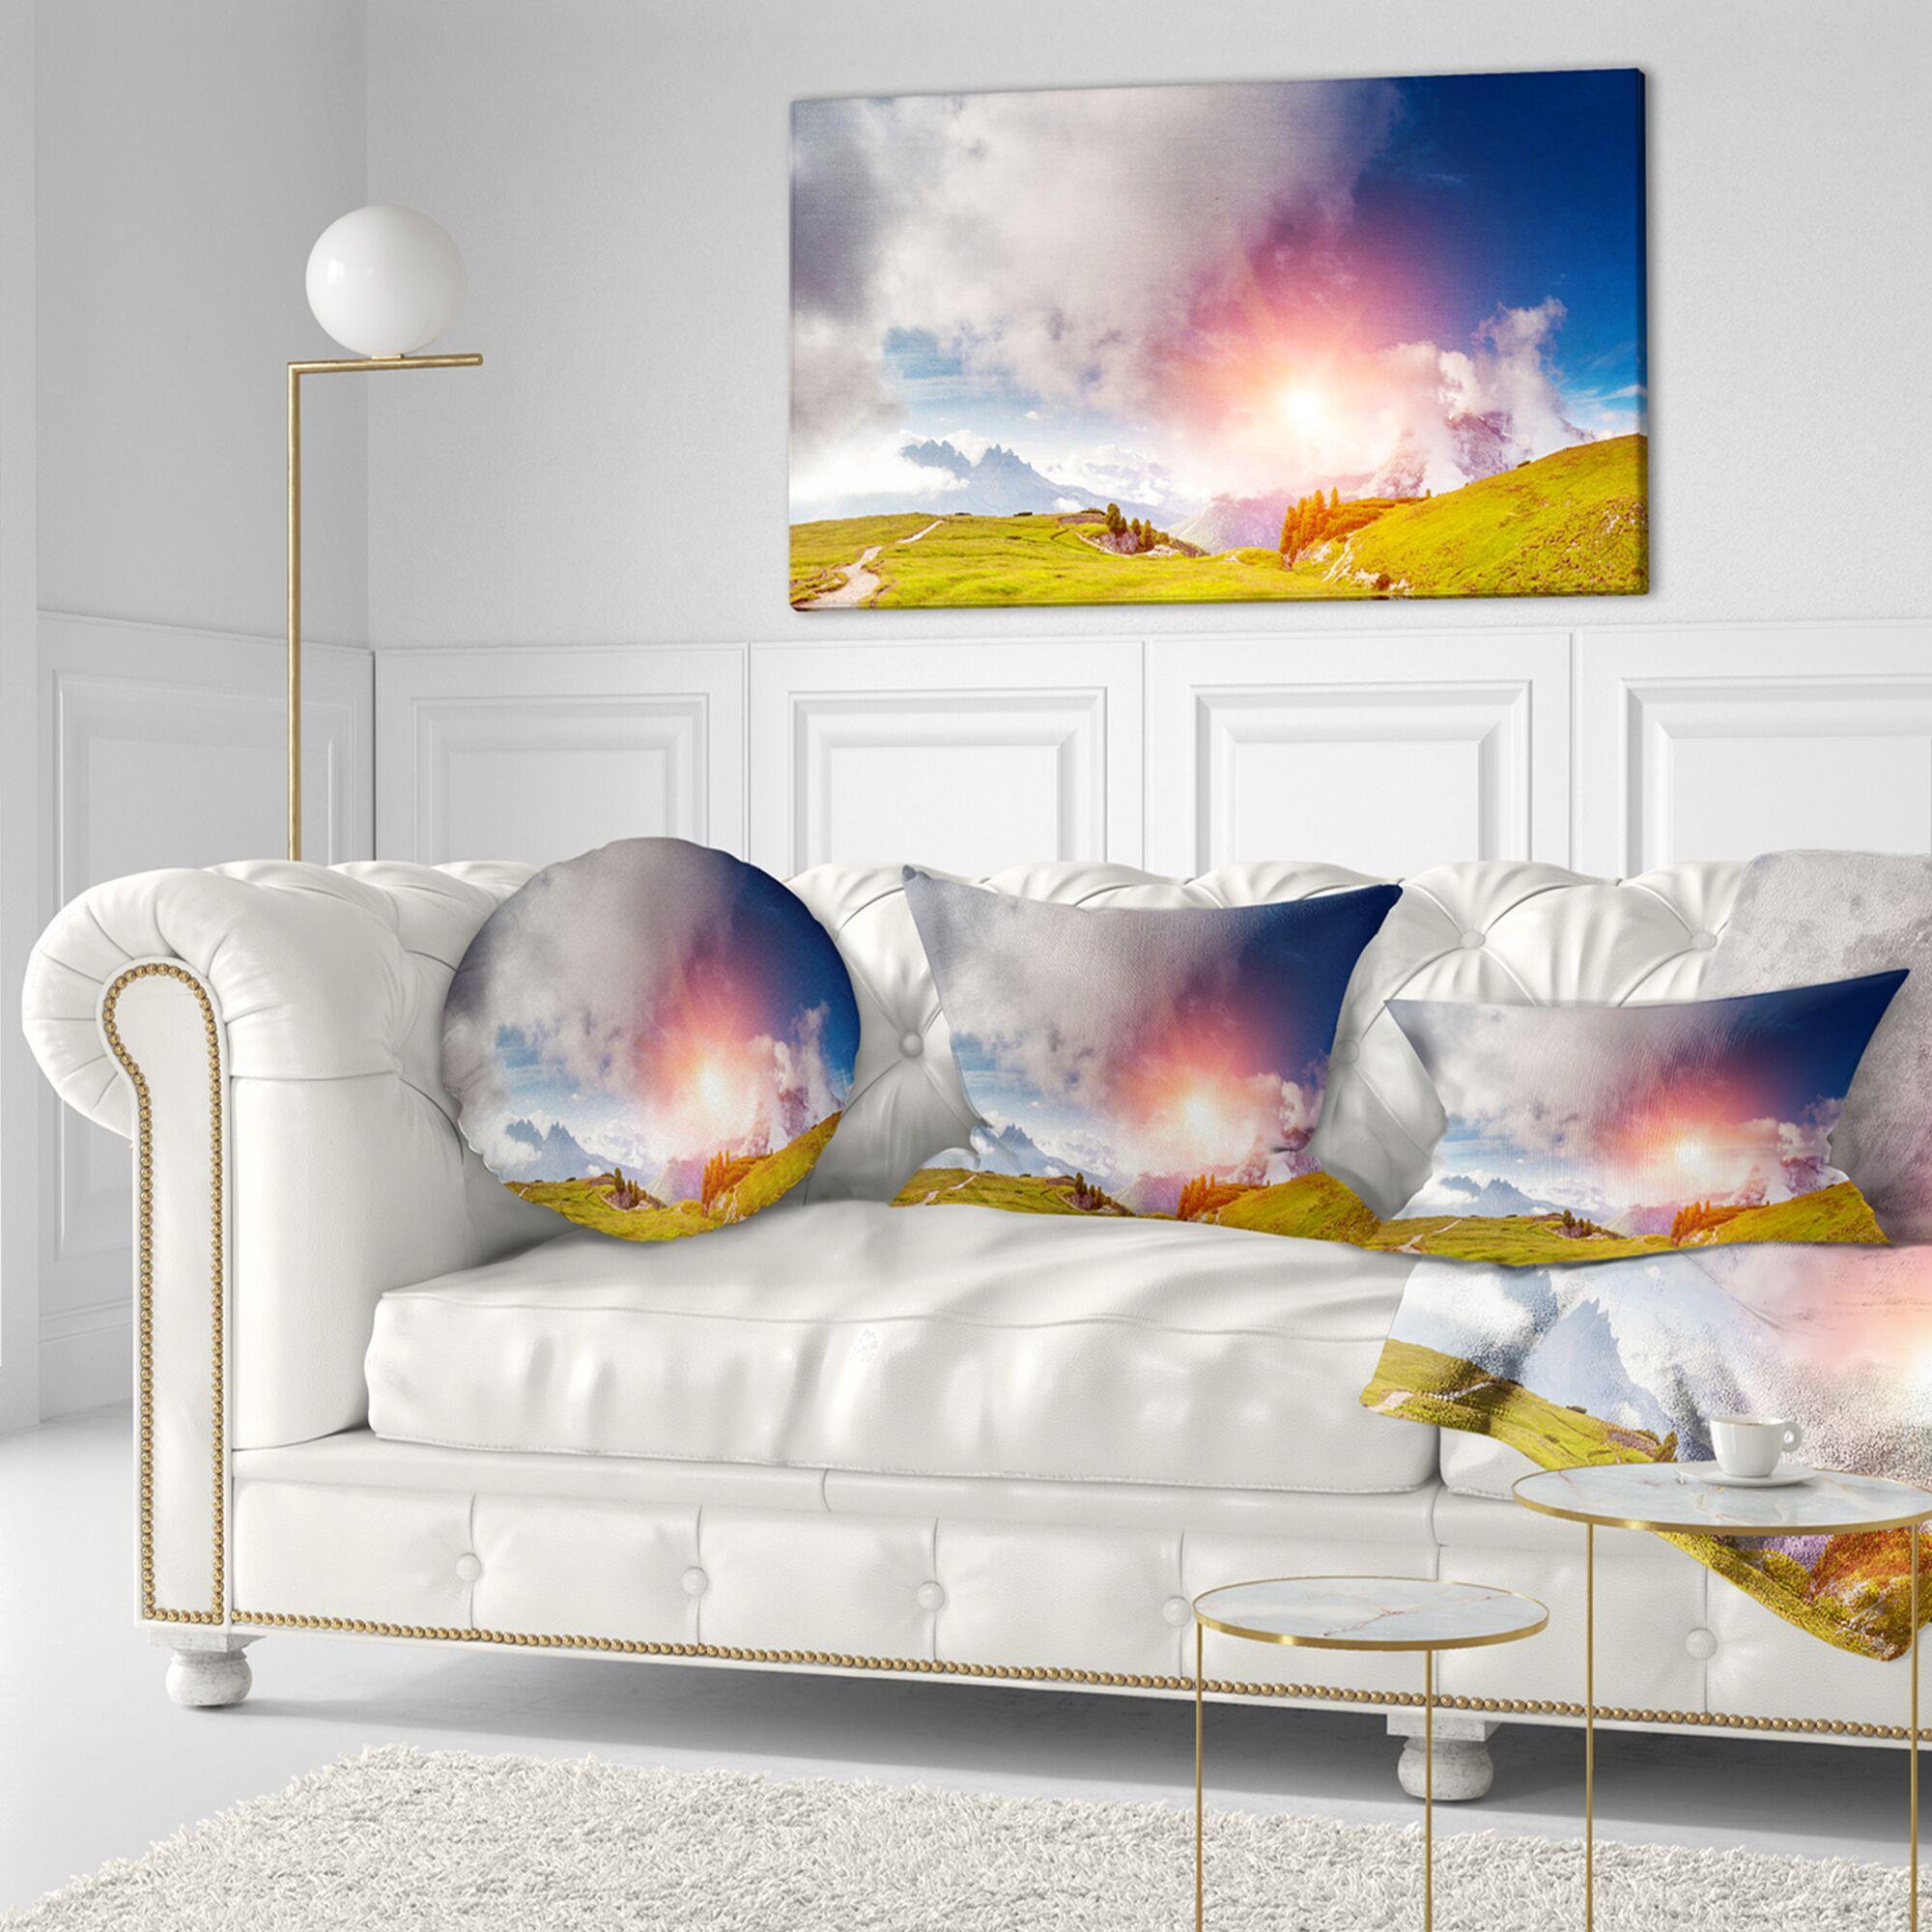 Landscape Printed Cadini di Misurina Range at Sunset Lumbar Pillow